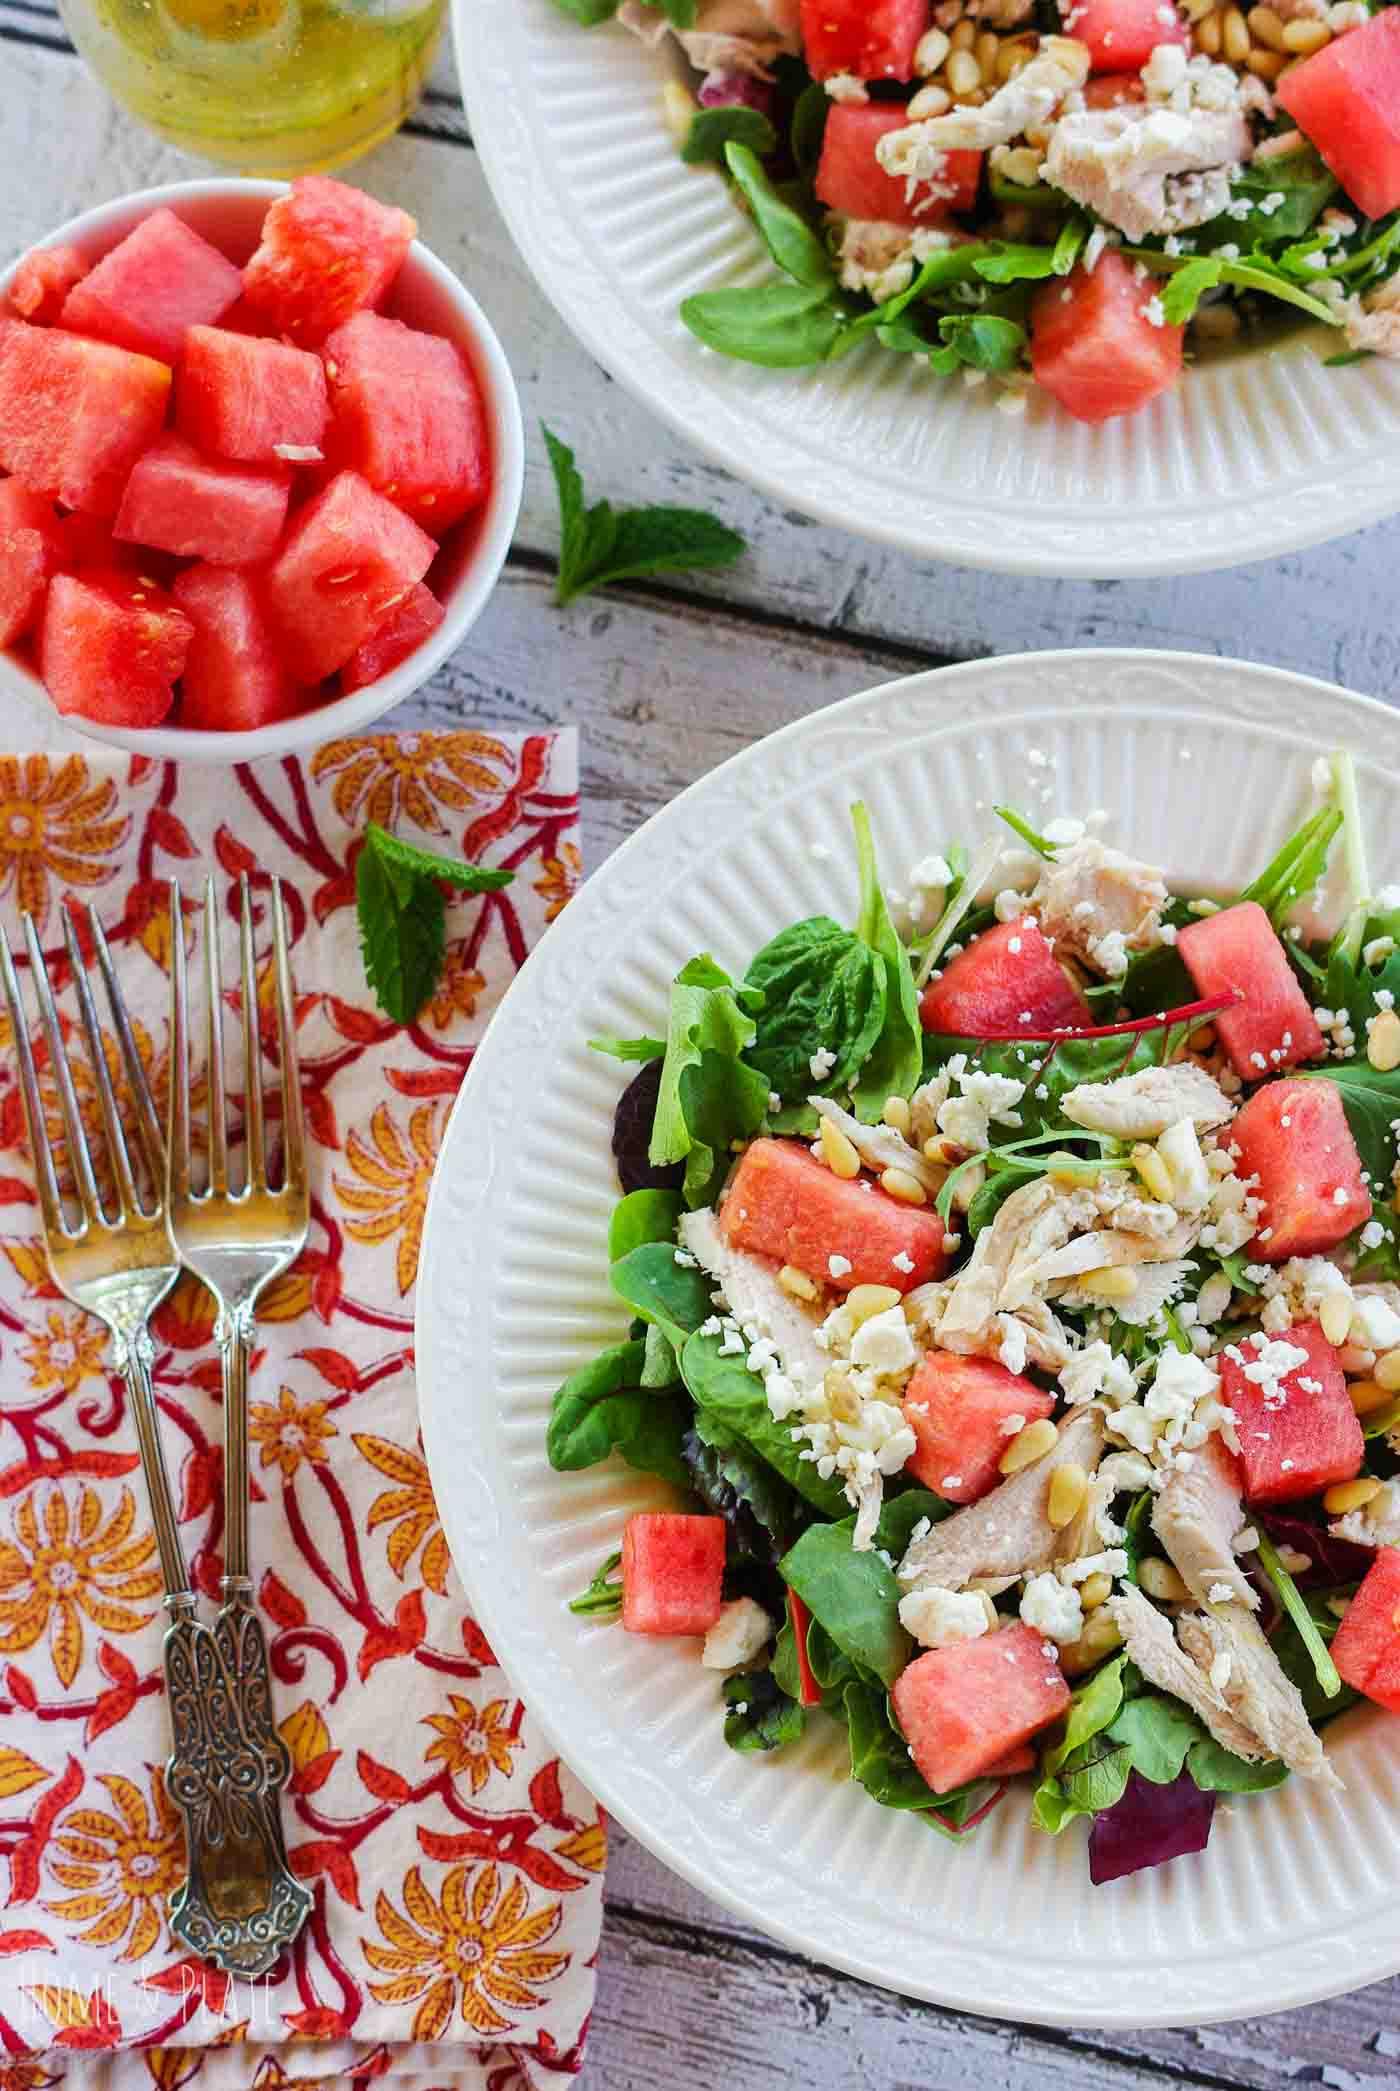 Summertime Dinner Ideas  Healthy Summer Dinner Recipes July Meal Plan Rainbow